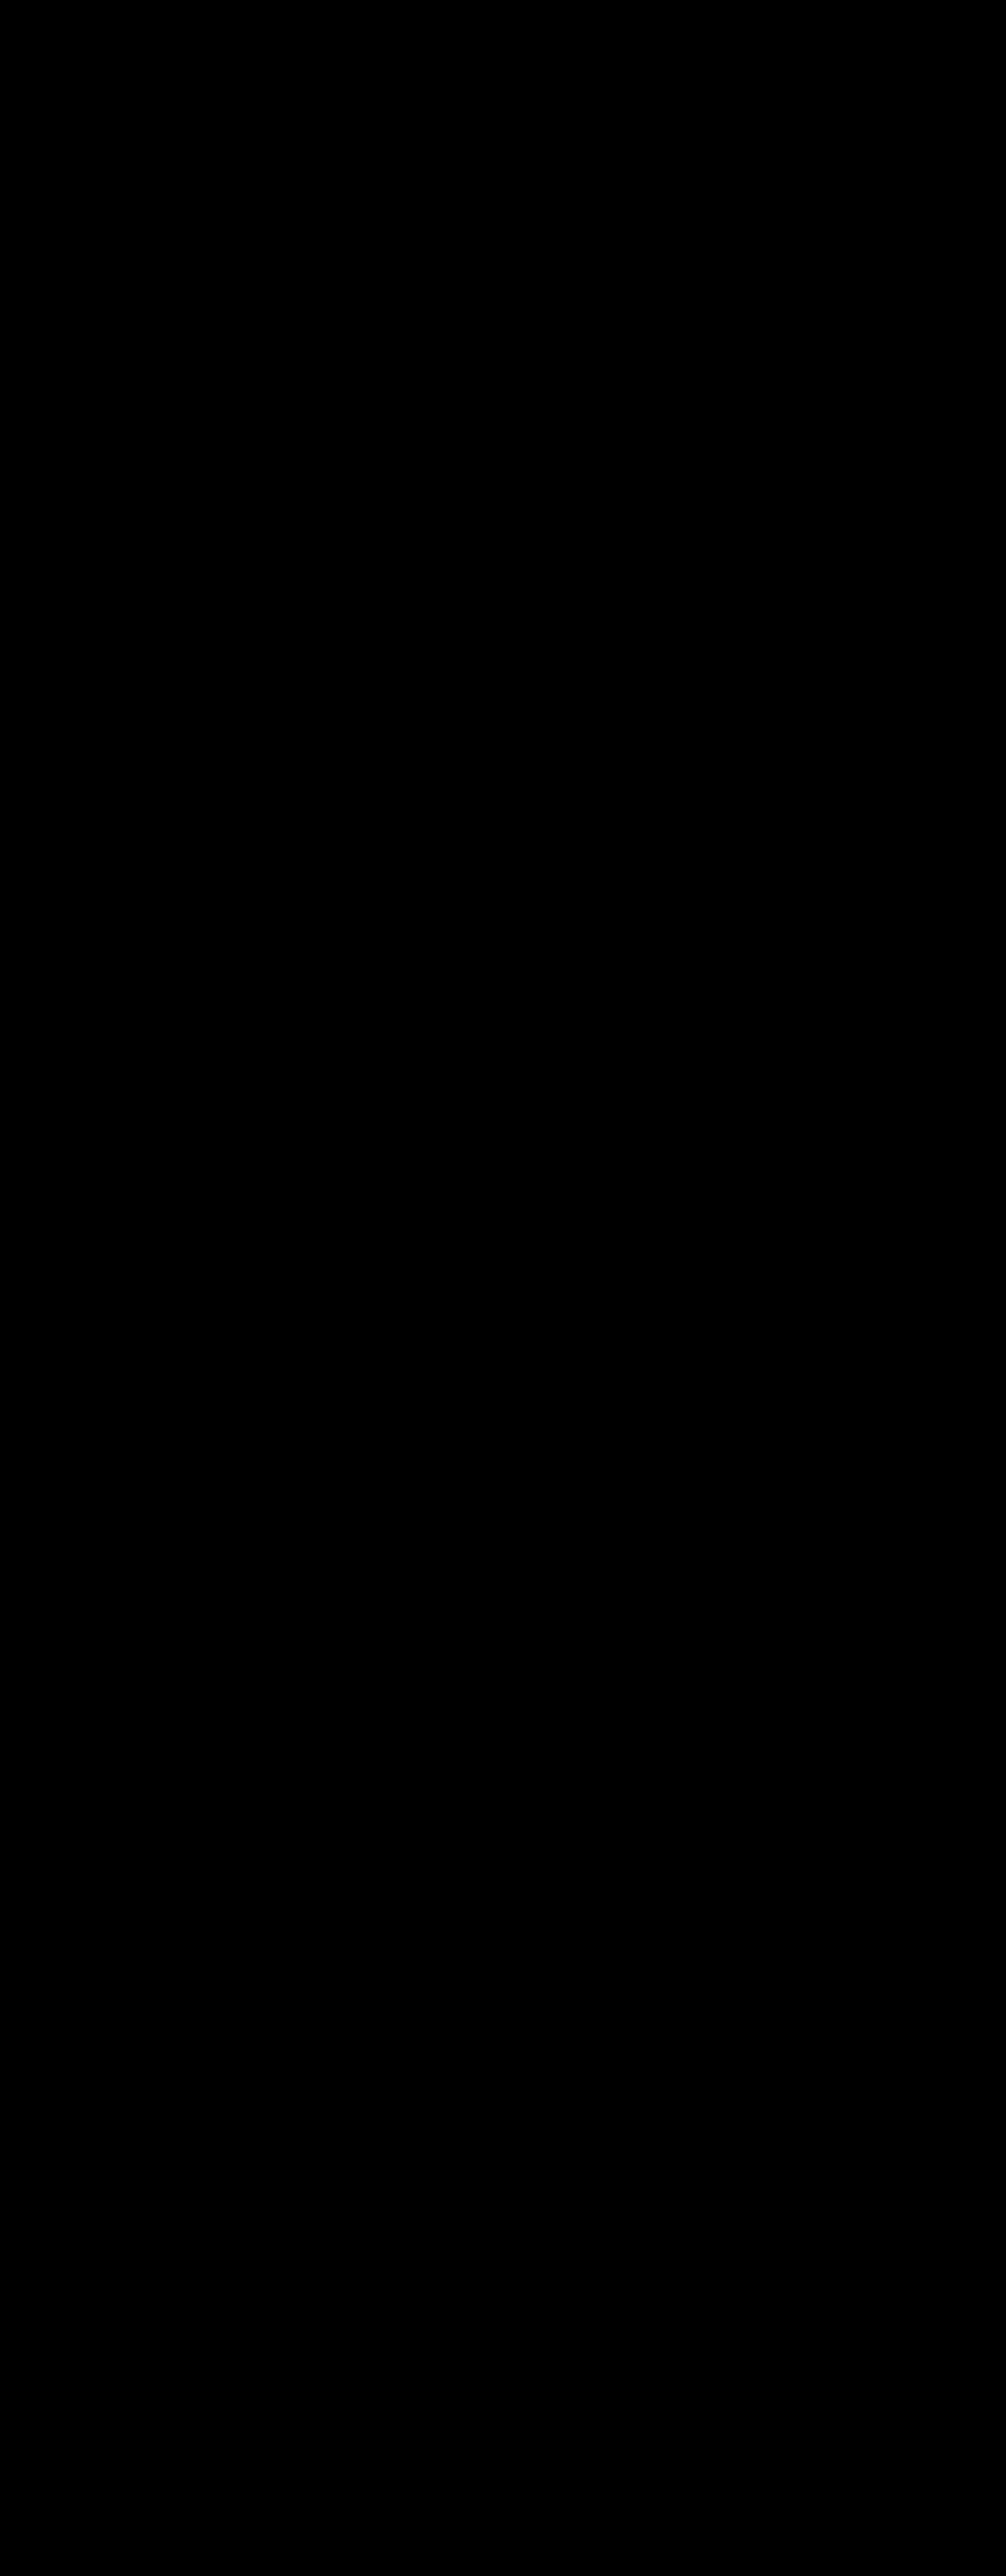 sonny glasbrenner